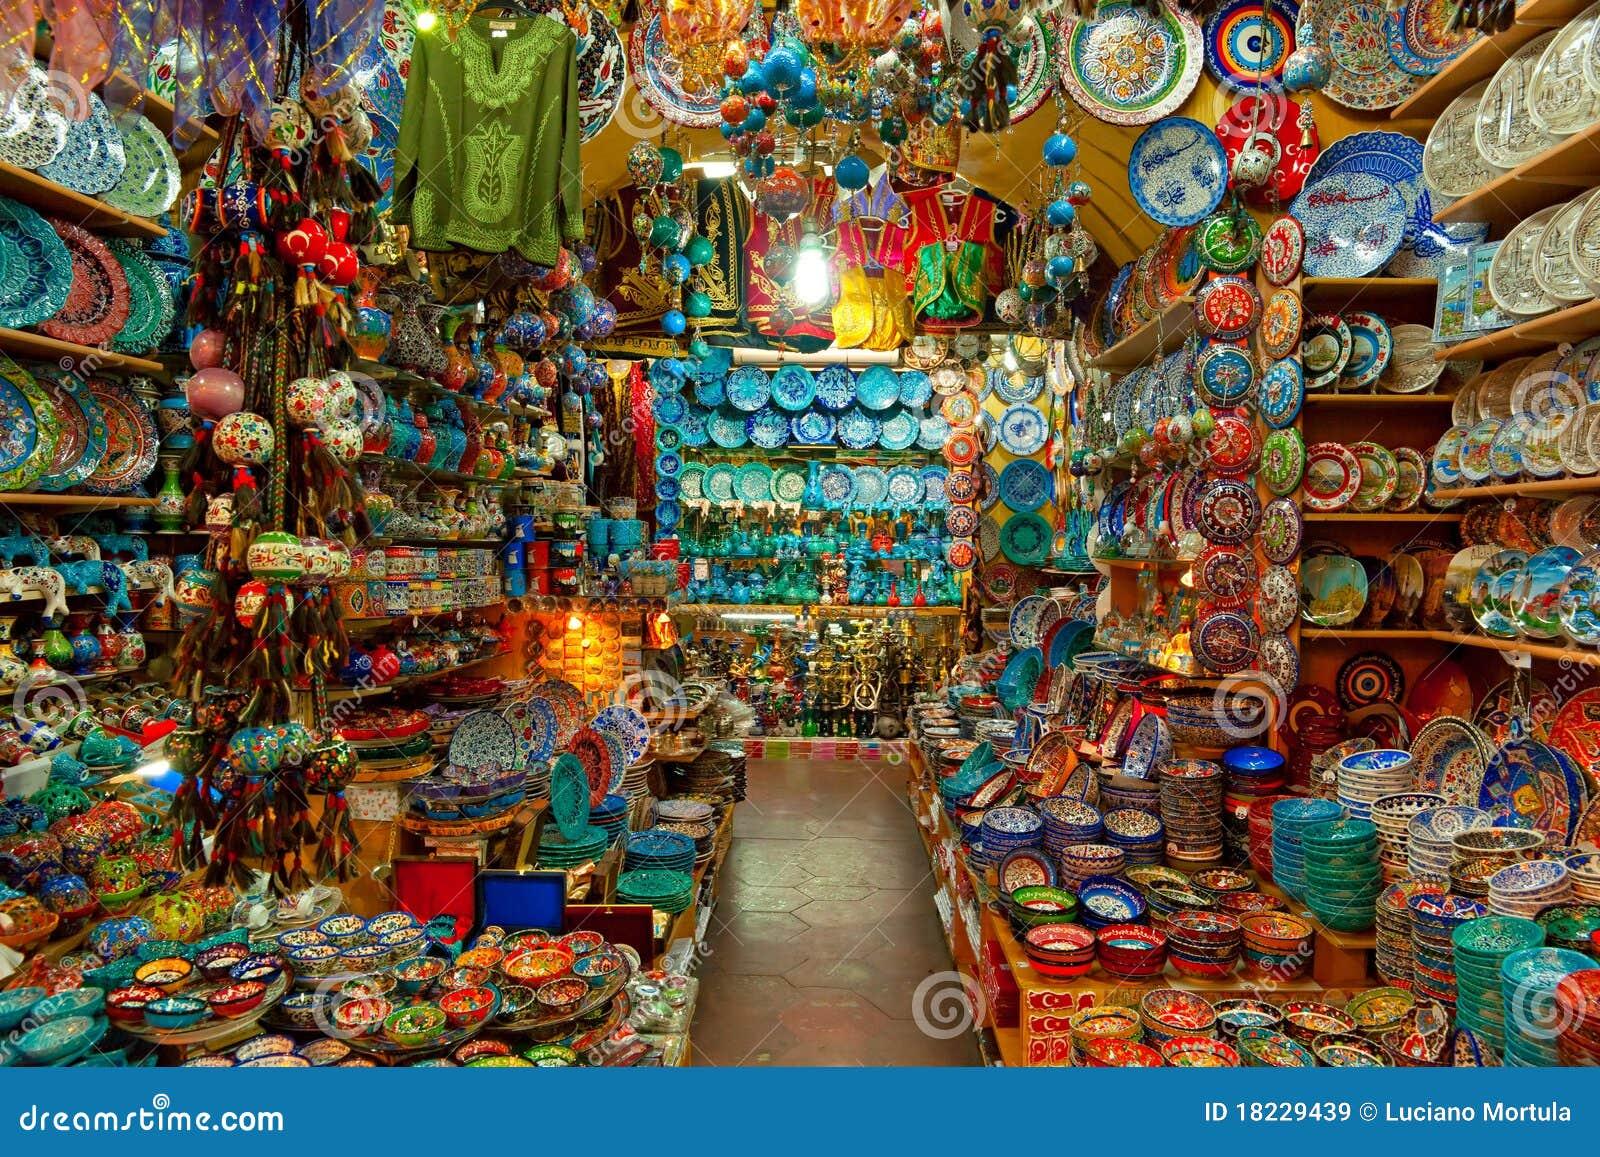 Grote bazaarwinkels in Istanboel.